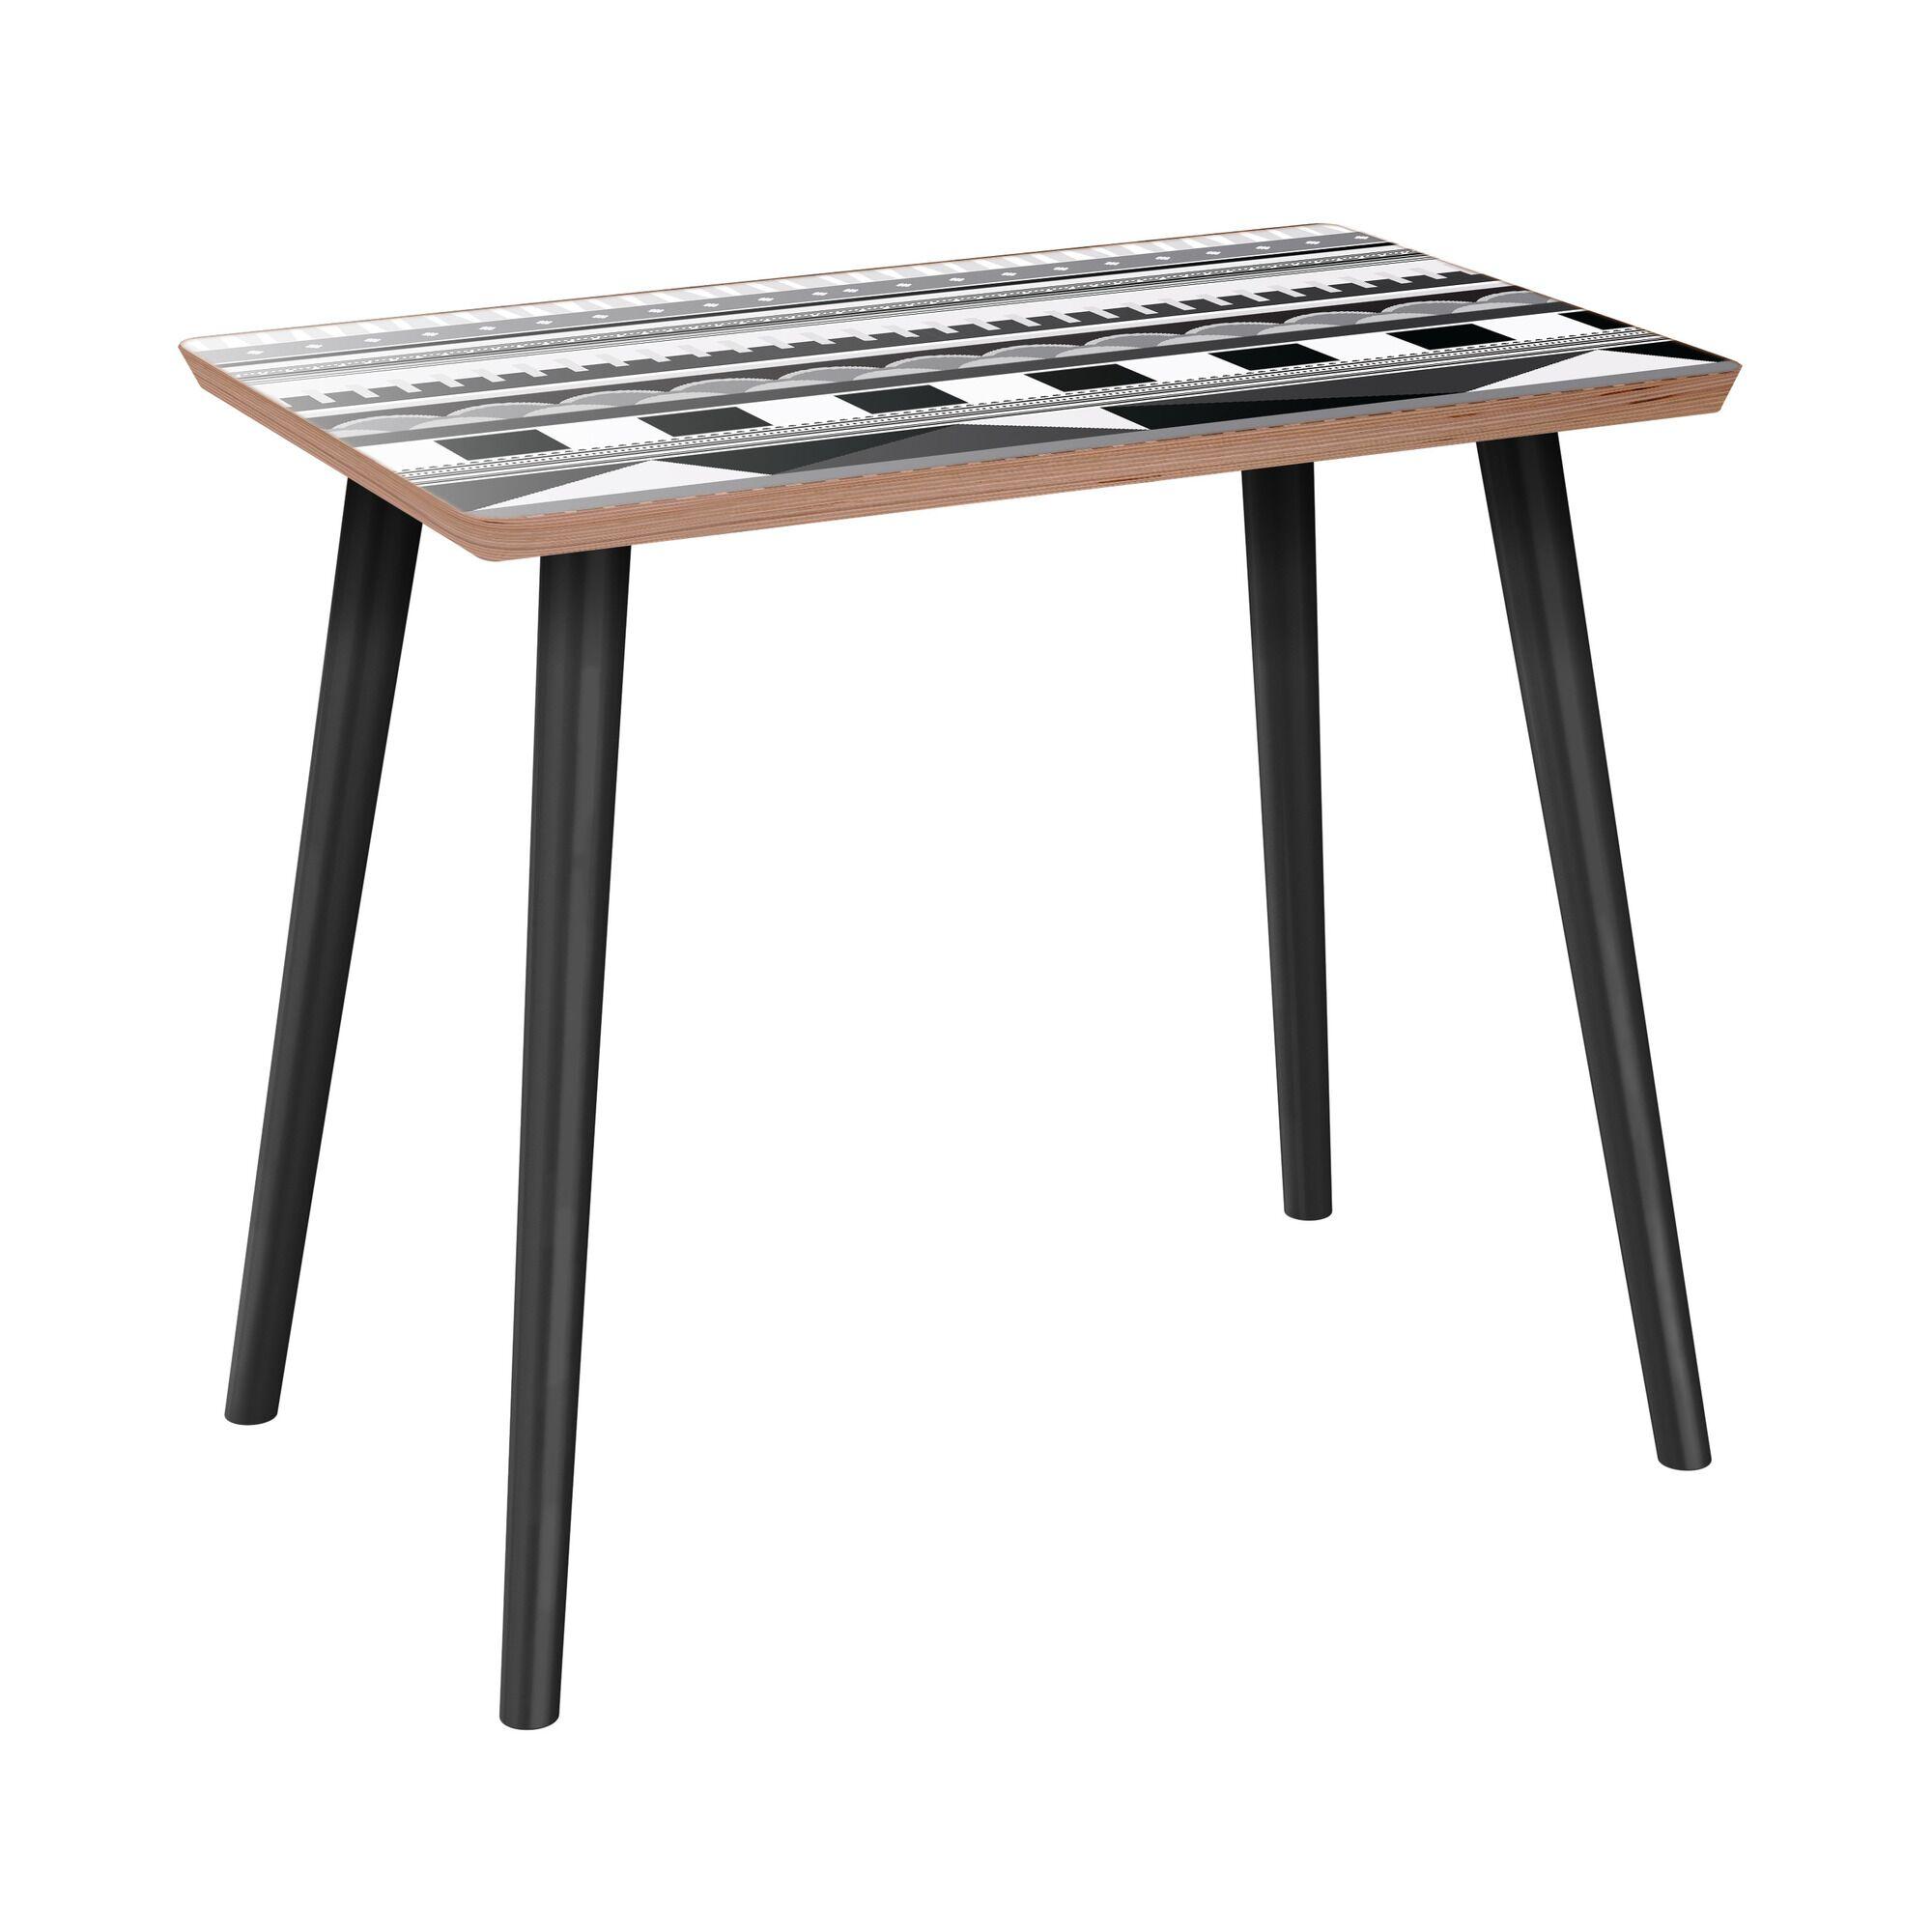 Hornback End Table Table Base Color: Black, Table Top Color: Walnut